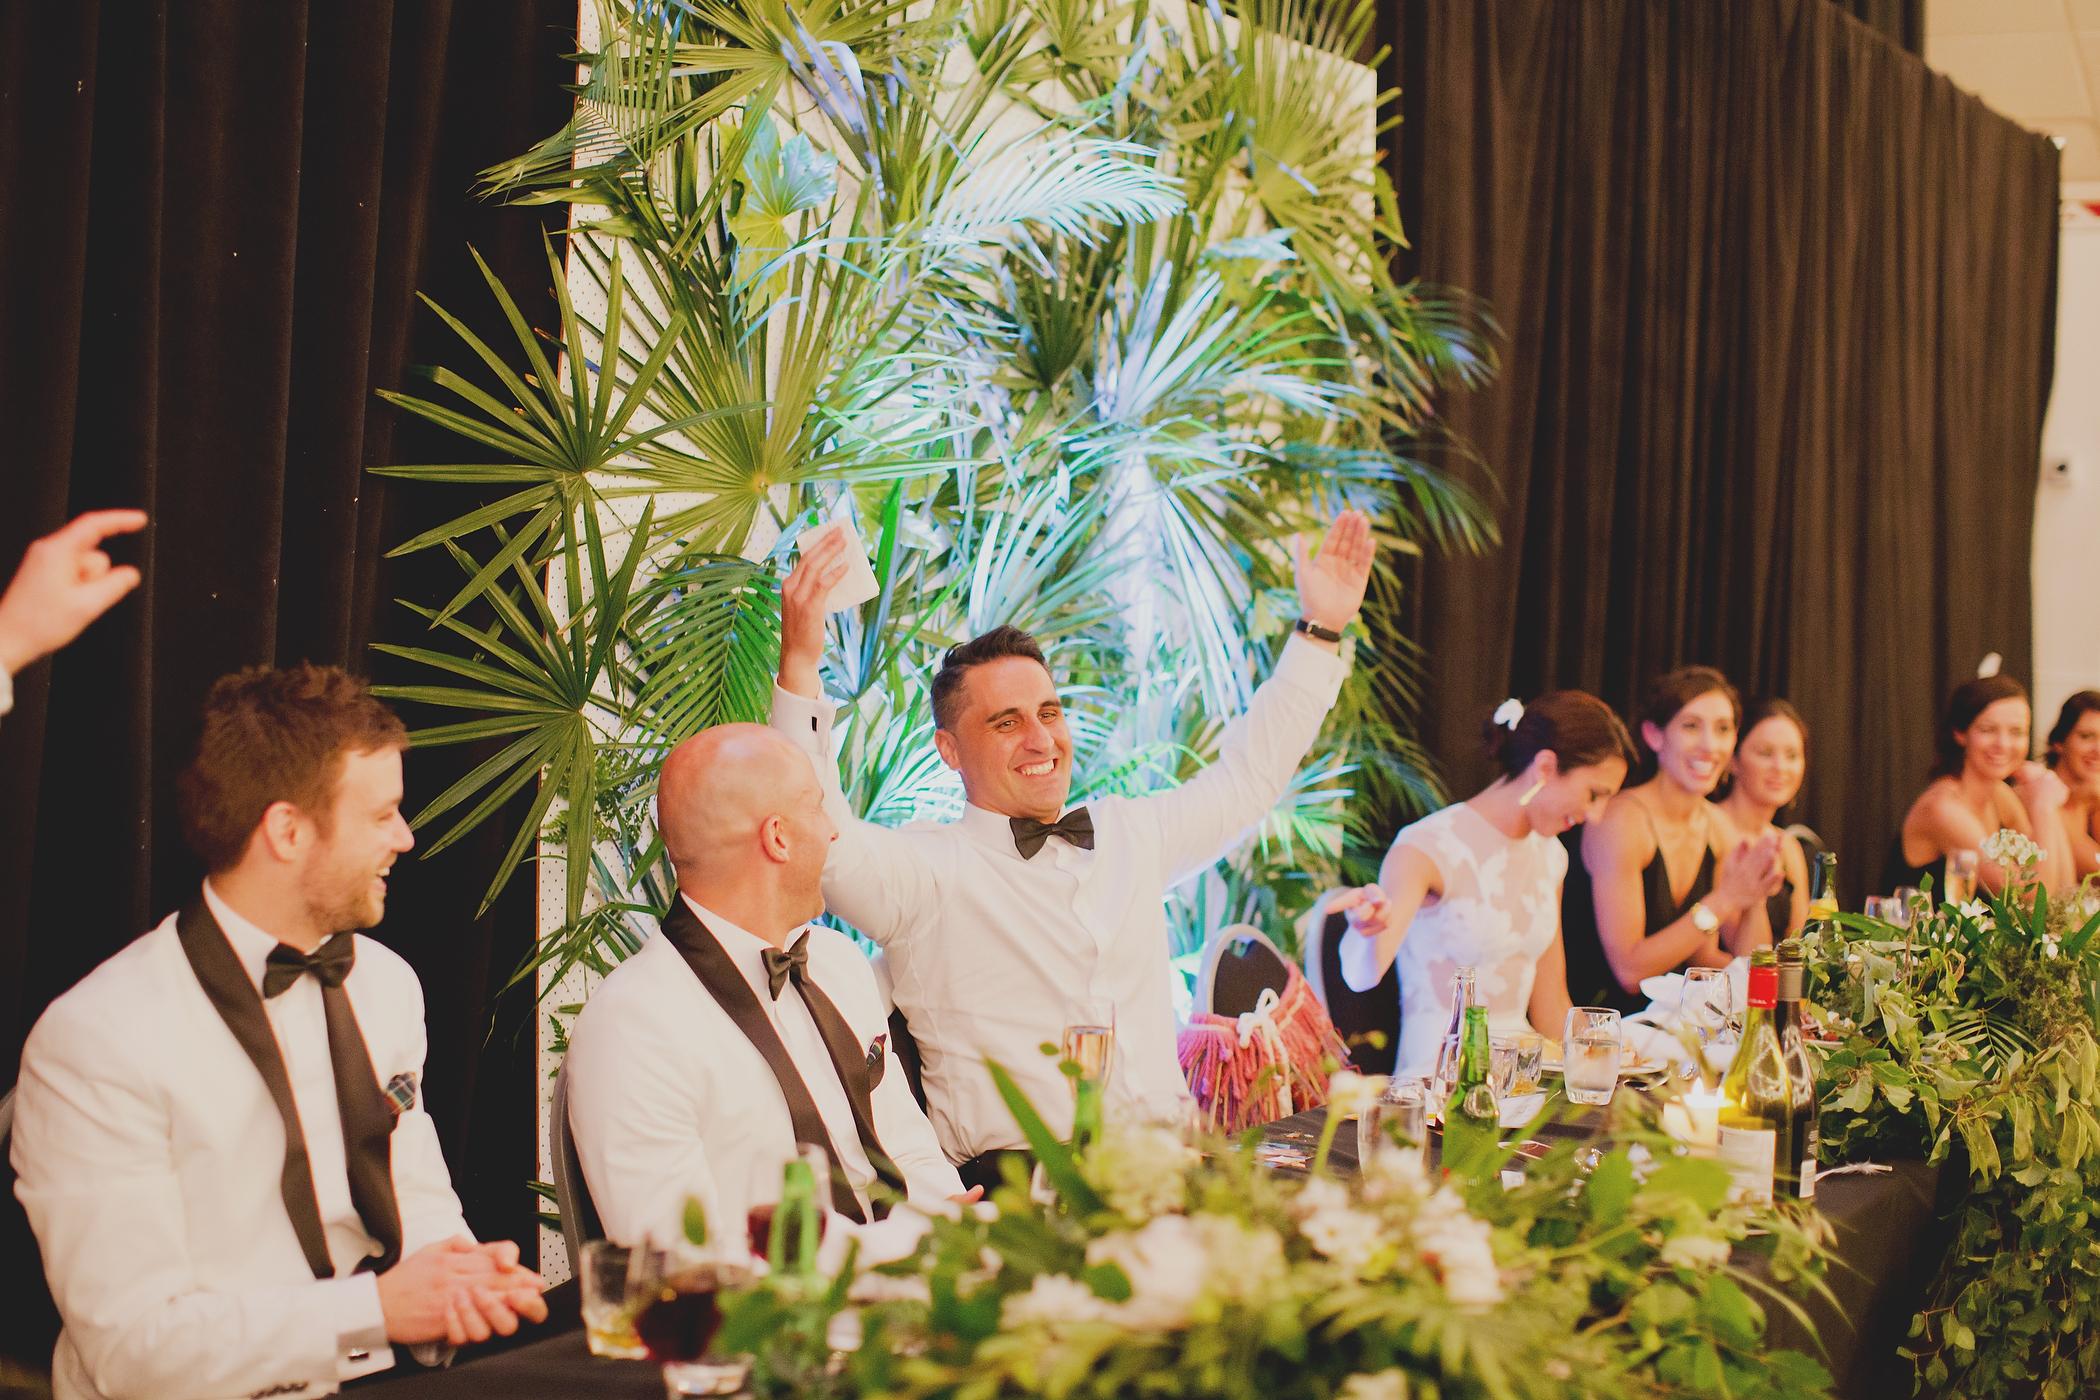 wellington wedding photography NZ - 1306.JPG